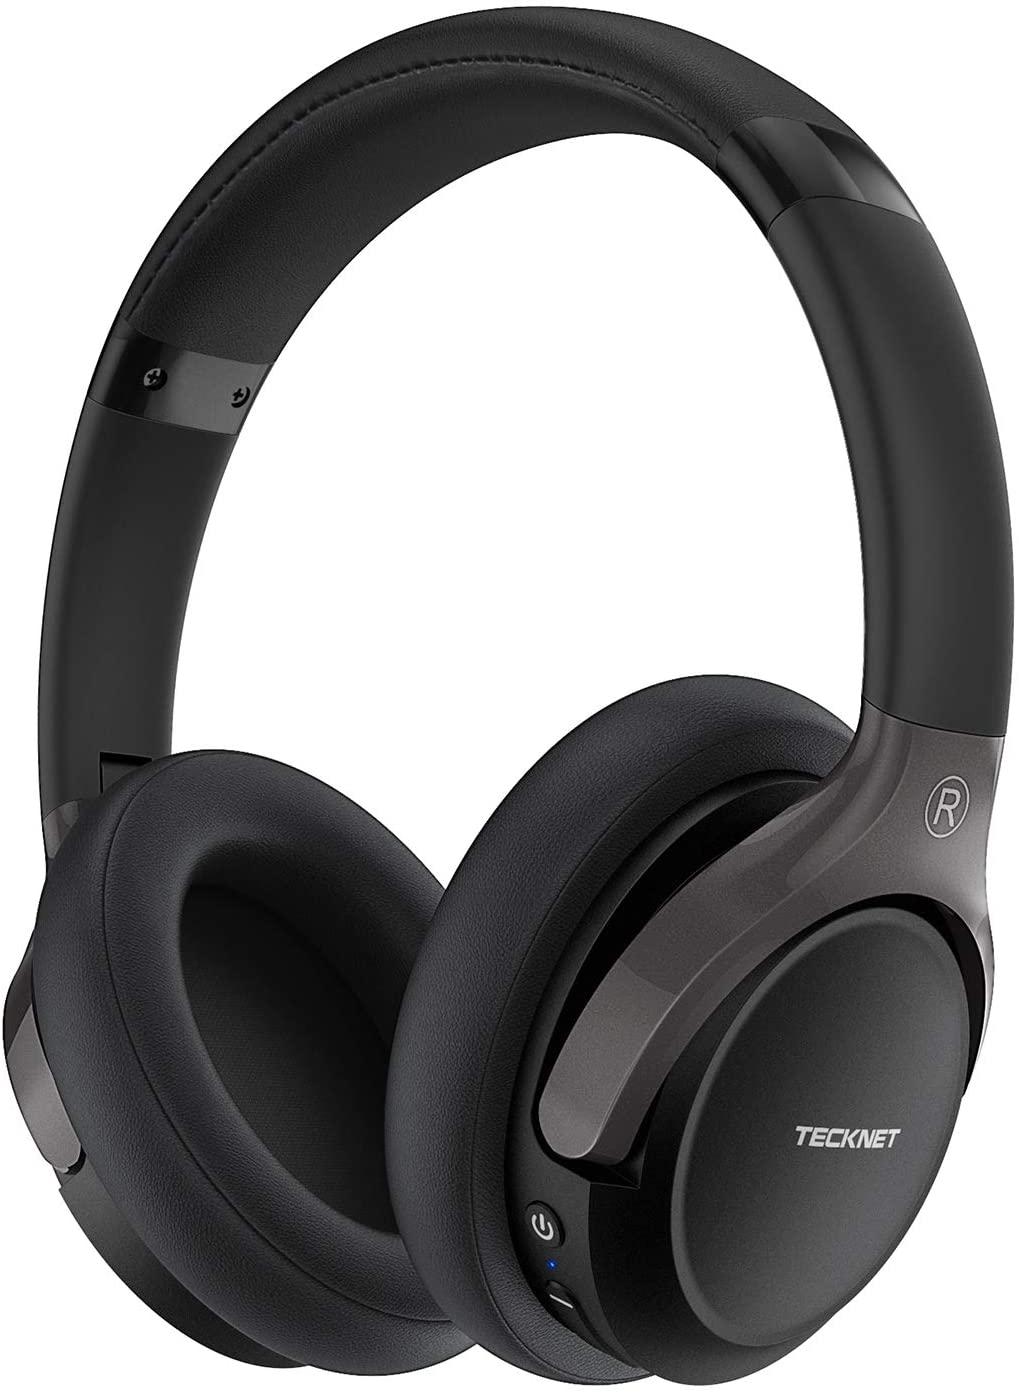 TeckNet Bluetooth Headphones Over Ear, Hi-Fi Stereo Wireless Headset,Foldable, Soft Memory Earmuffs, Audio Cable, CVC 6.0 Mic Noise-Reduction,for PC/Laptop/Cell Phones/Ipad/TV